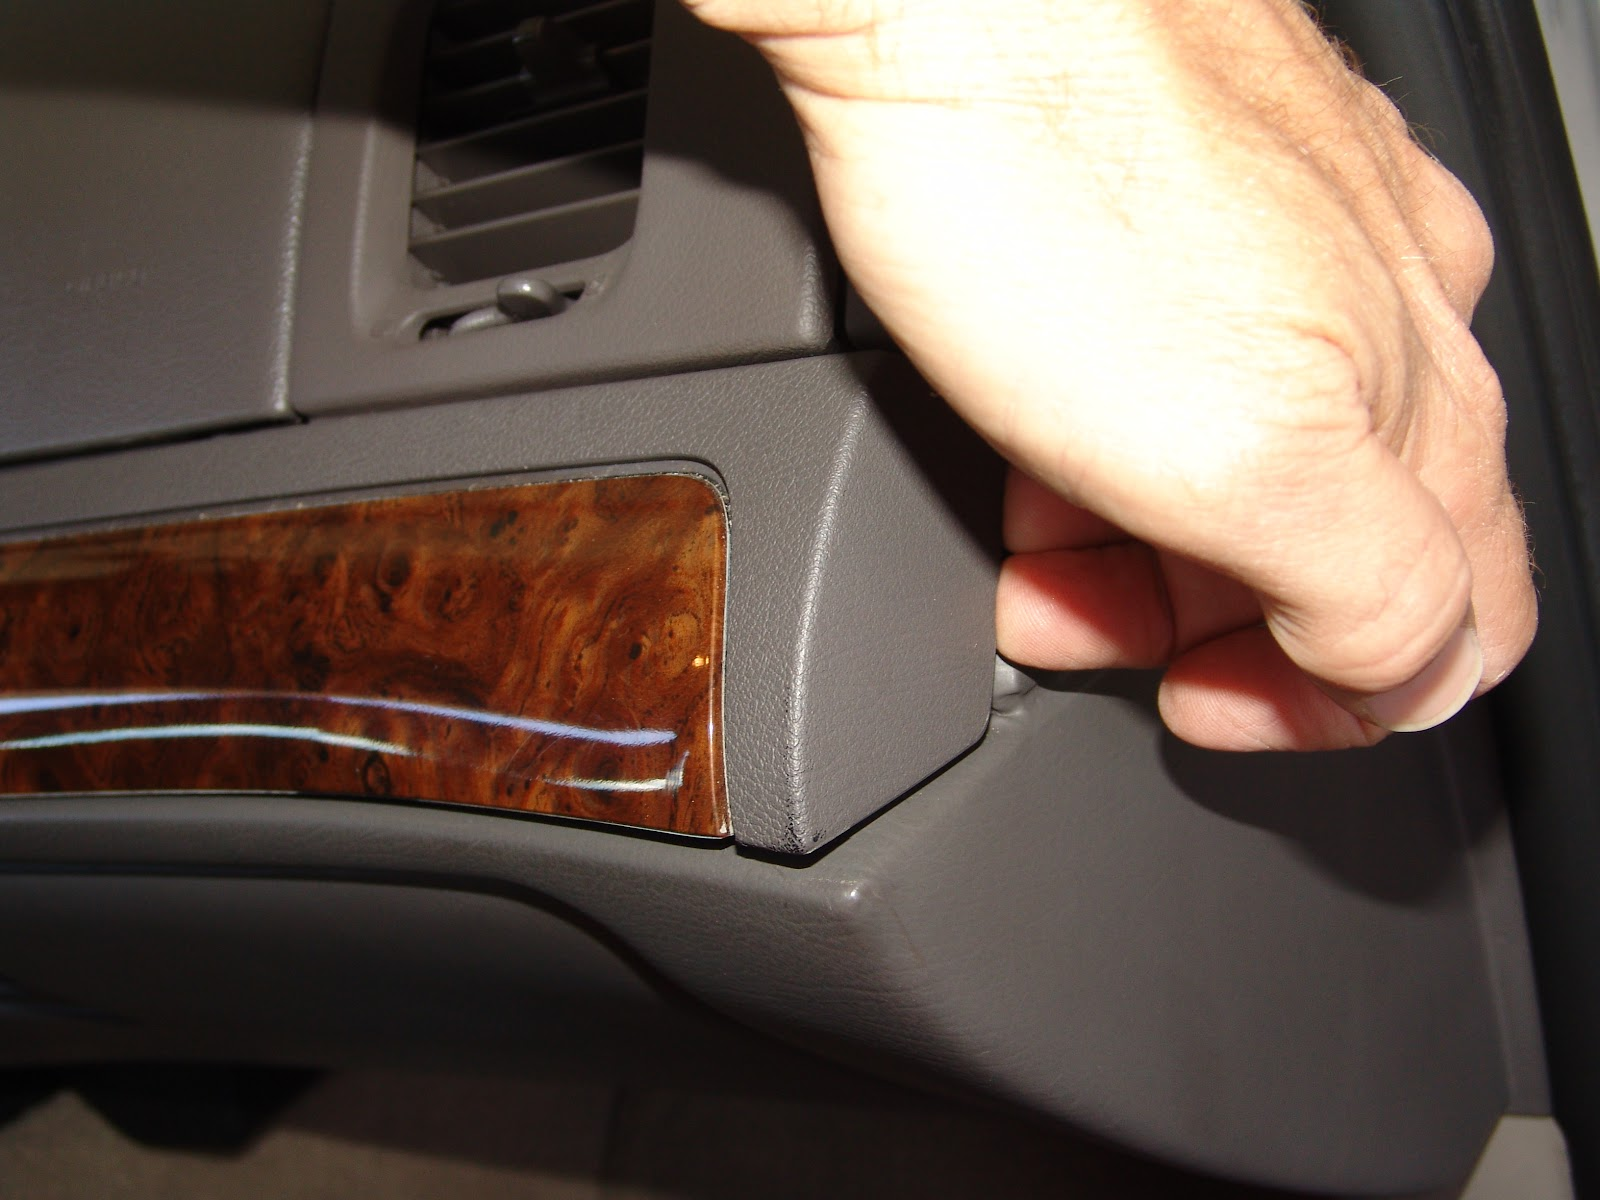 Jaguar S Type Fuse Box Diagram Wiring Harness Wiring Diagram